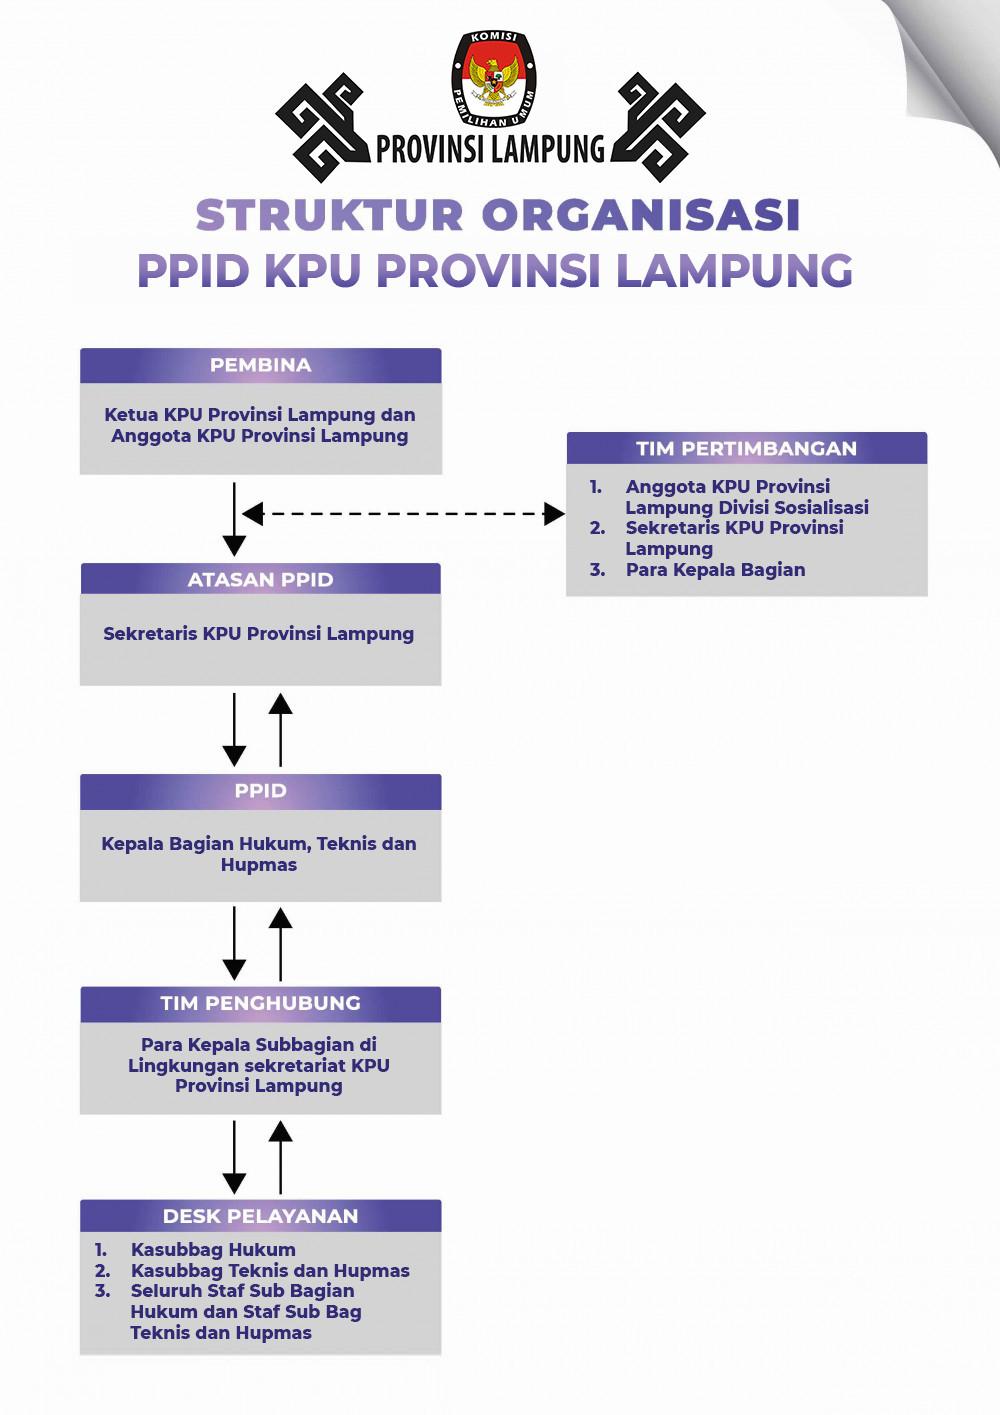 Struktur PPID KPU Provinsi Lampung